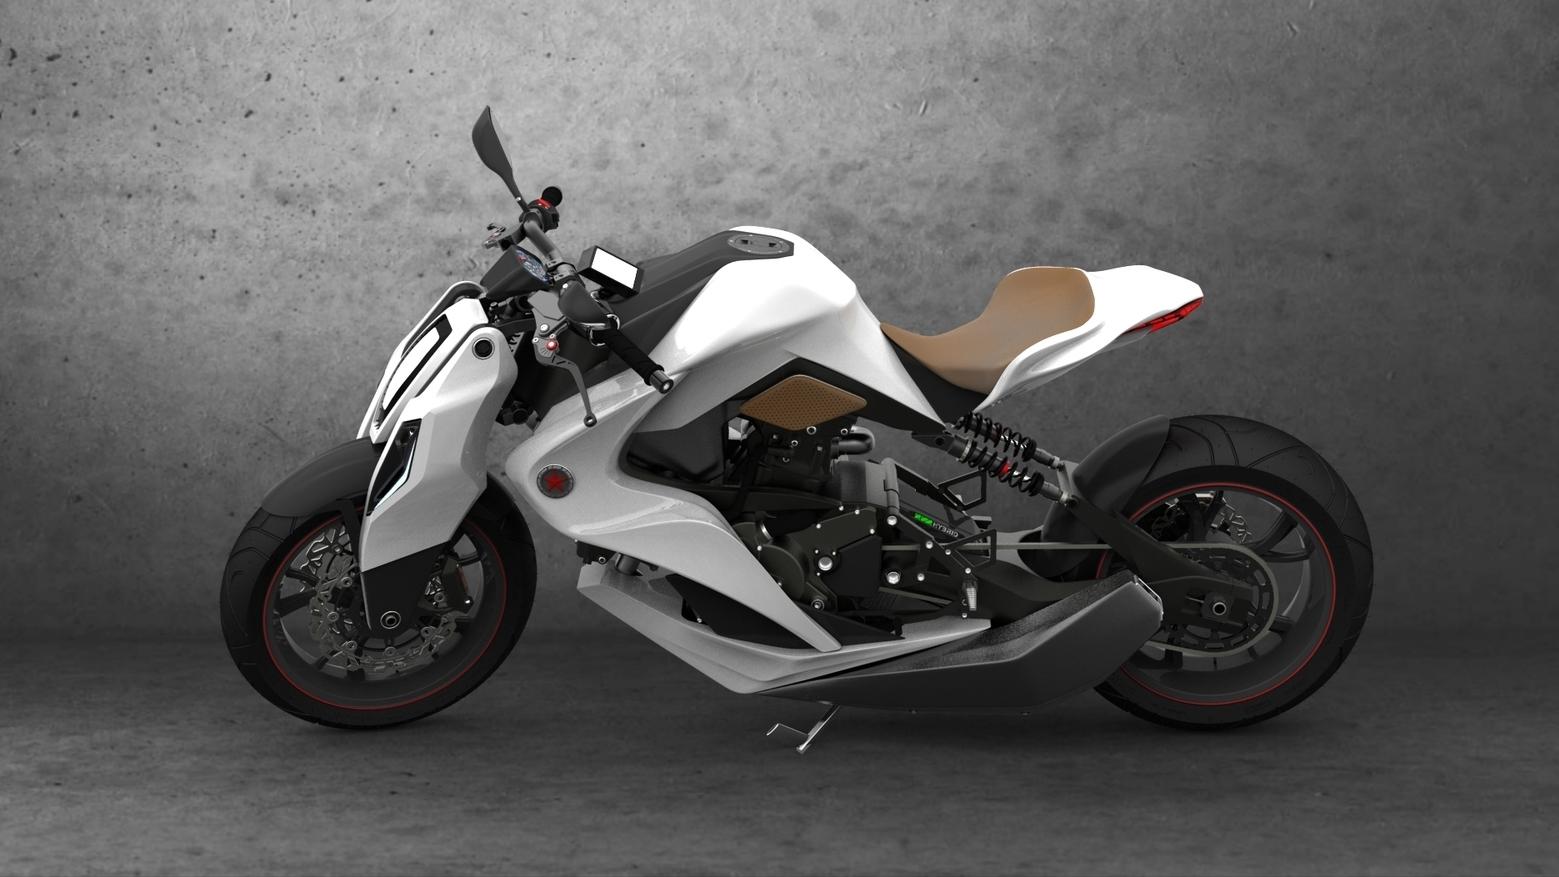 2015 Izh 750 Concept